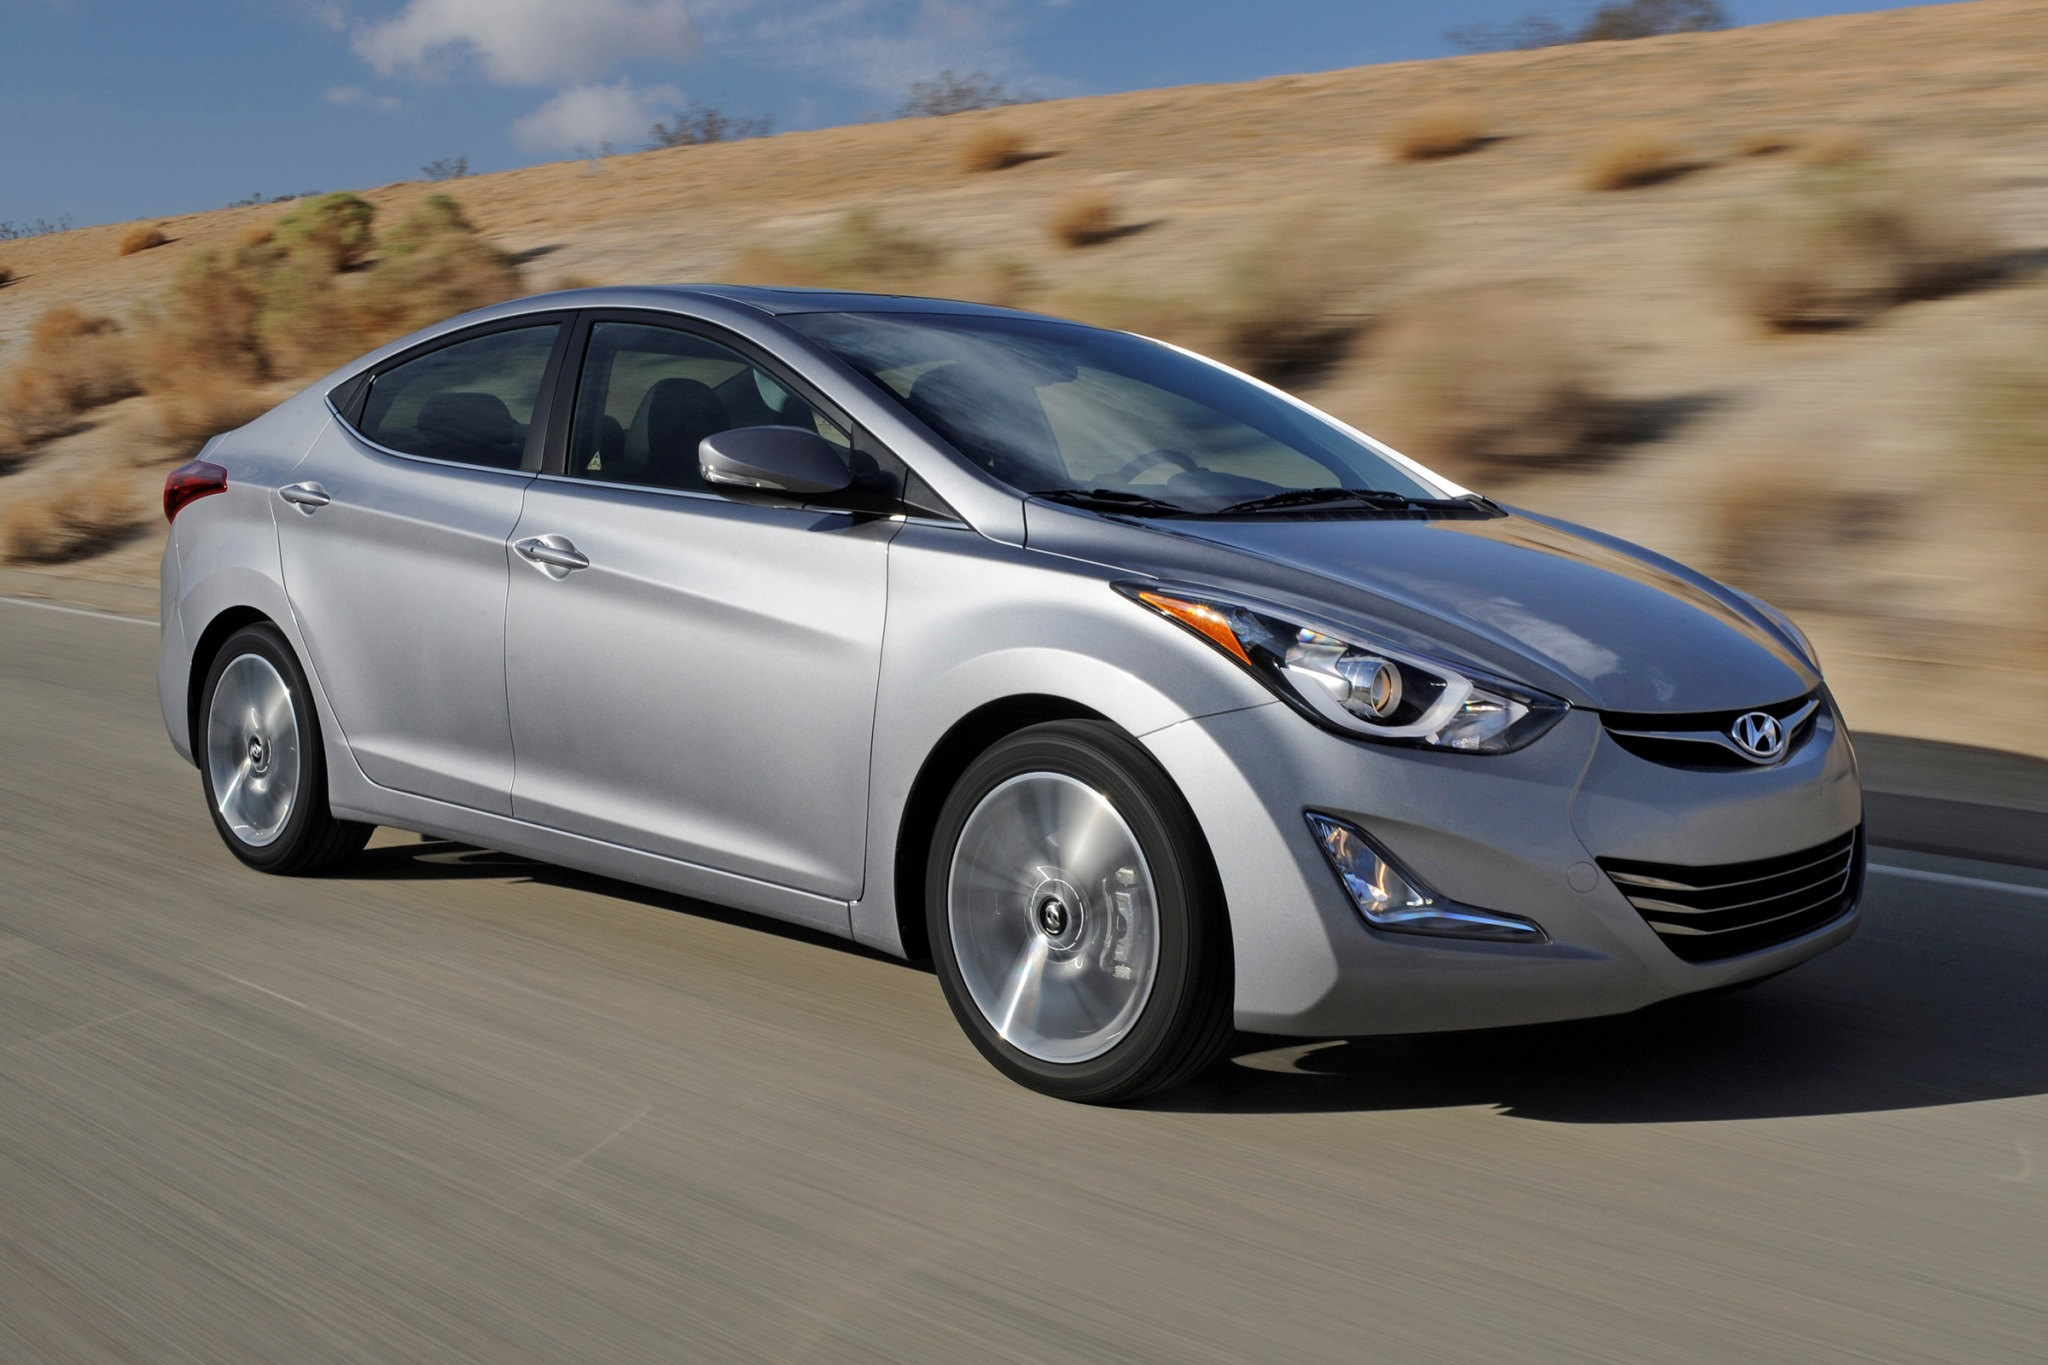 2014 Hyundai Elantra Image 3